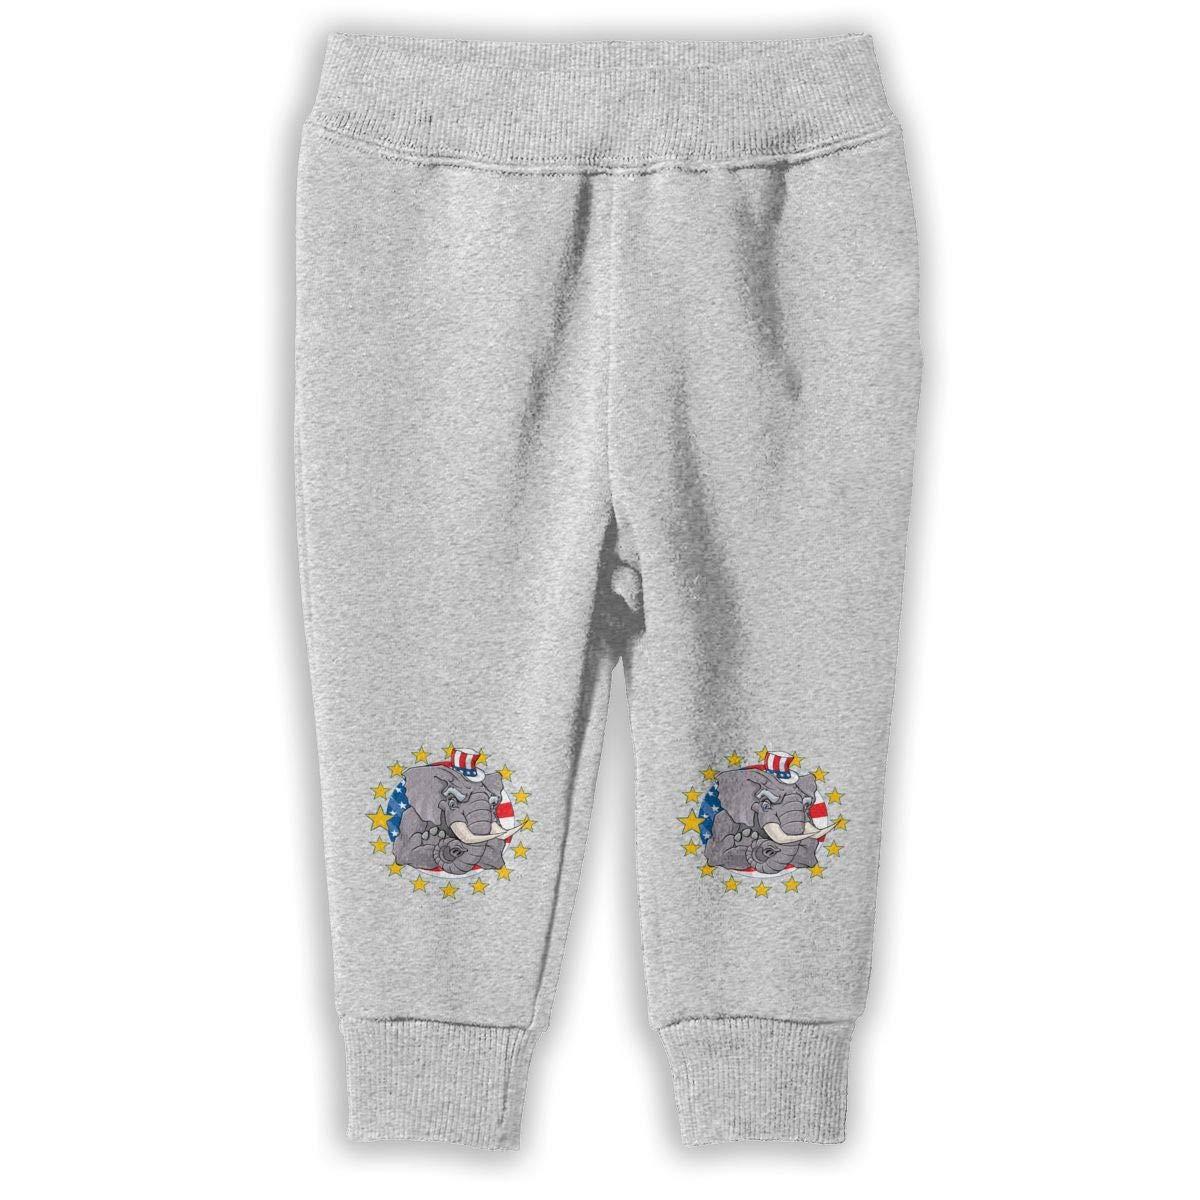 Sunshine Store Elephant 2020 Kids /& Toddler Pants Soft Cozy Kids Sweatpants